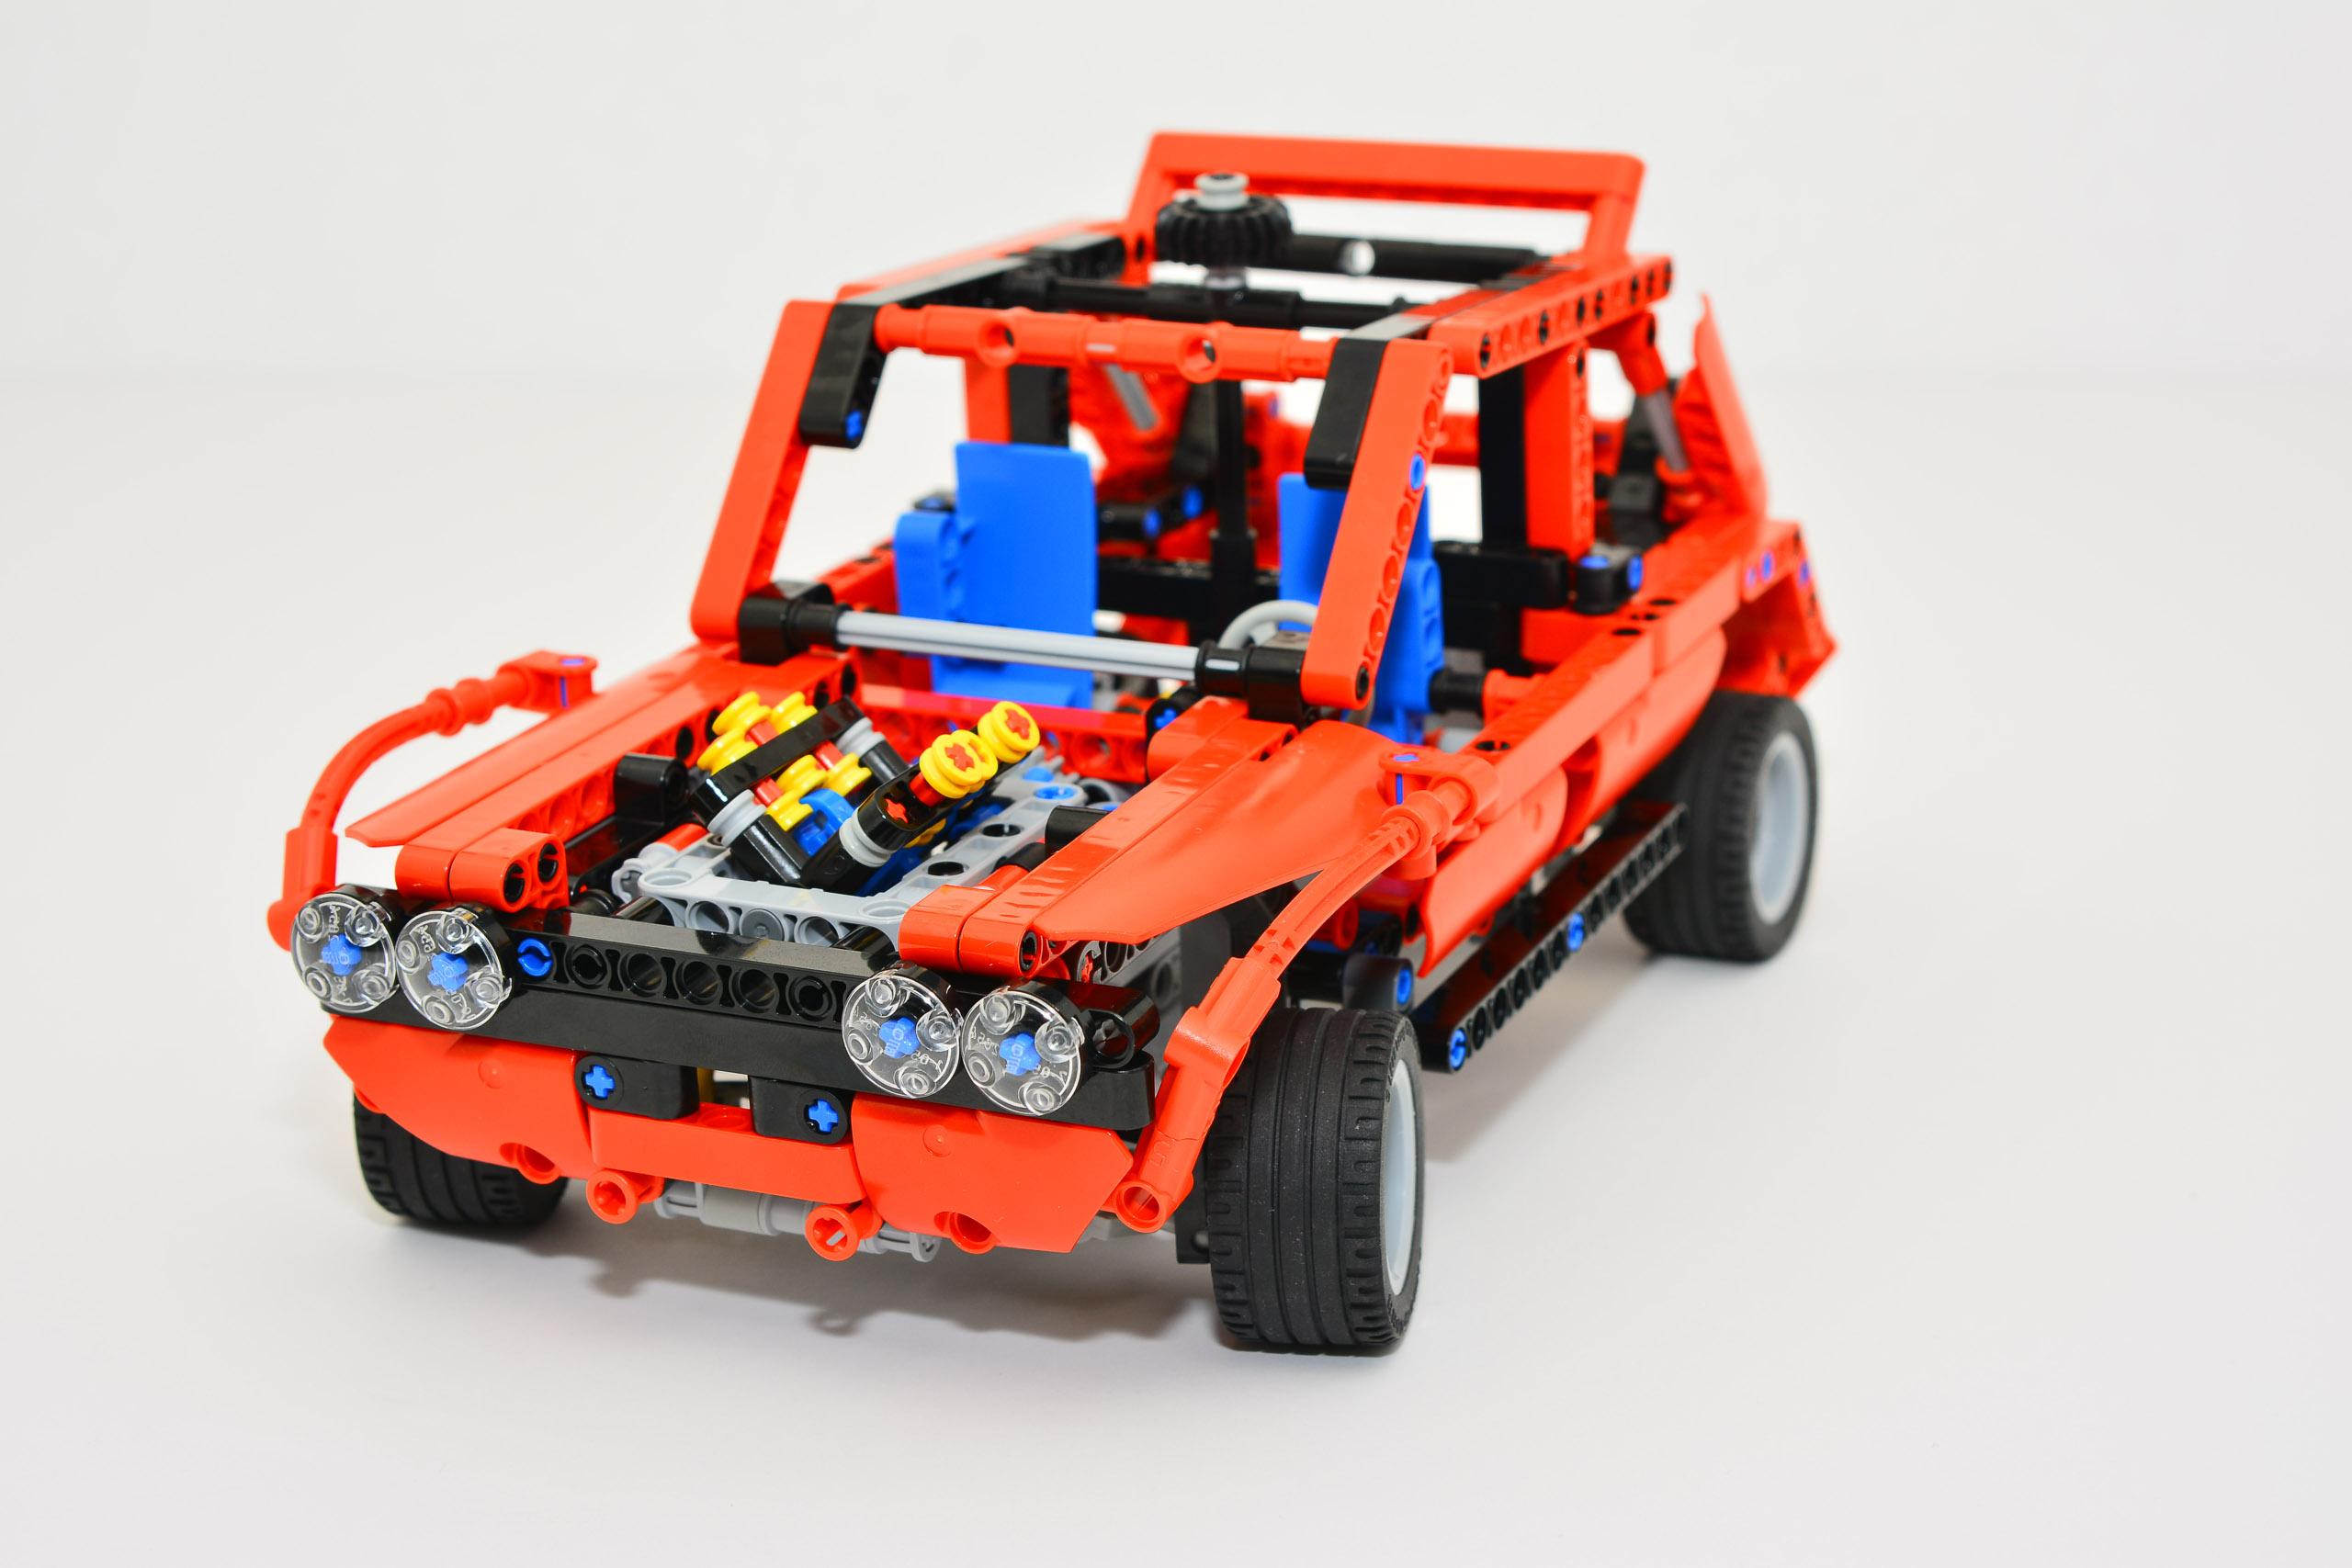 p lego small rally car alternate bricksafe. Black Bedroom Furniture Sets. Home Design Ideas